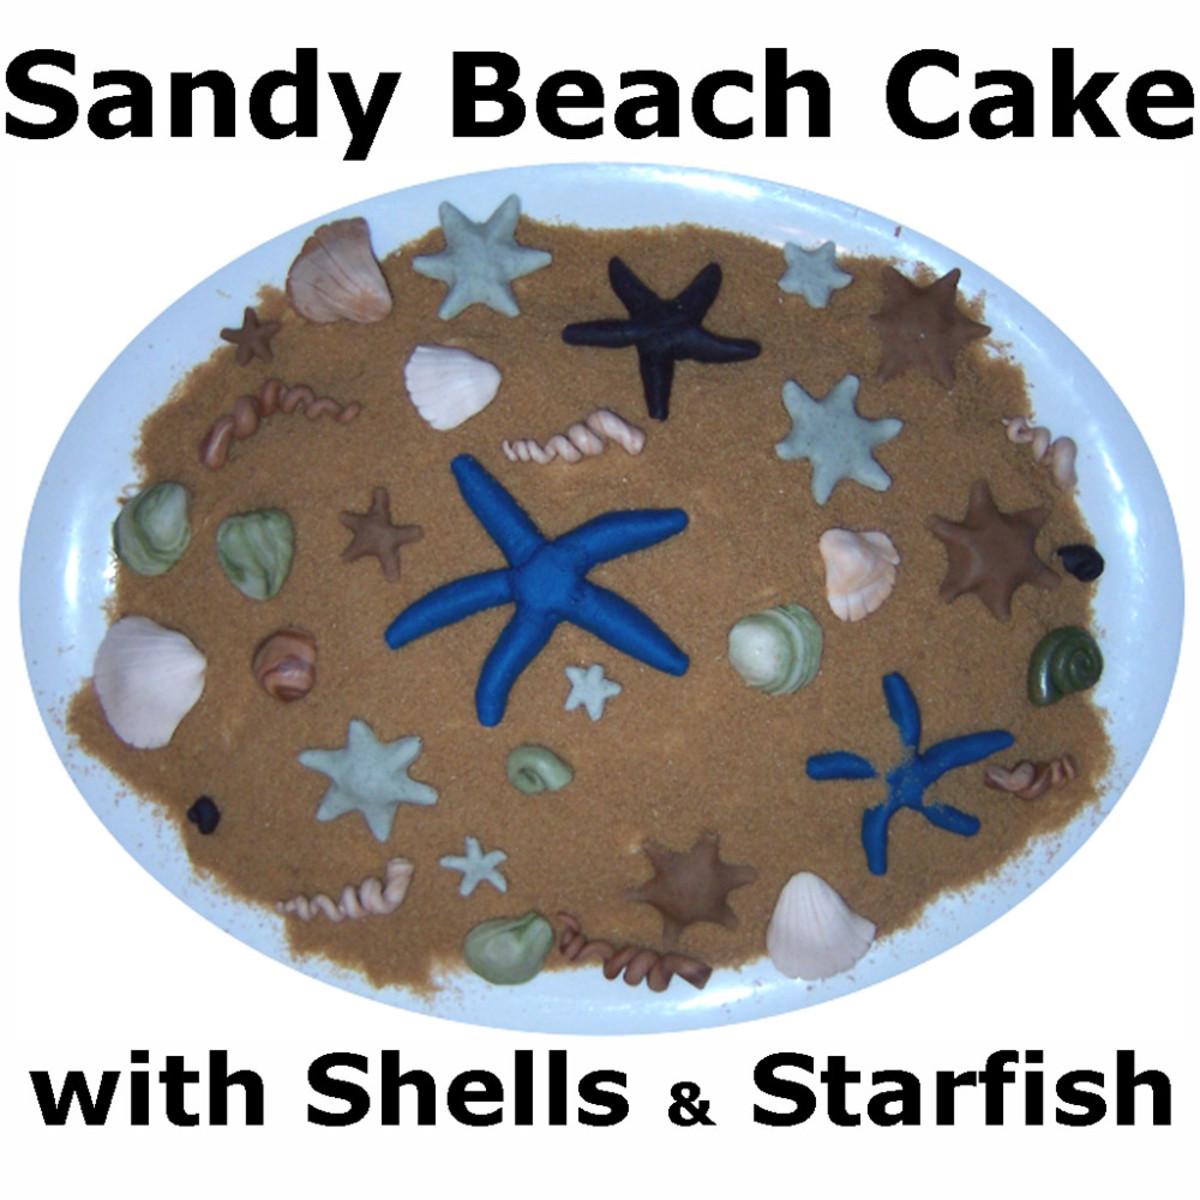 How to Make a Sandy Beach Cake